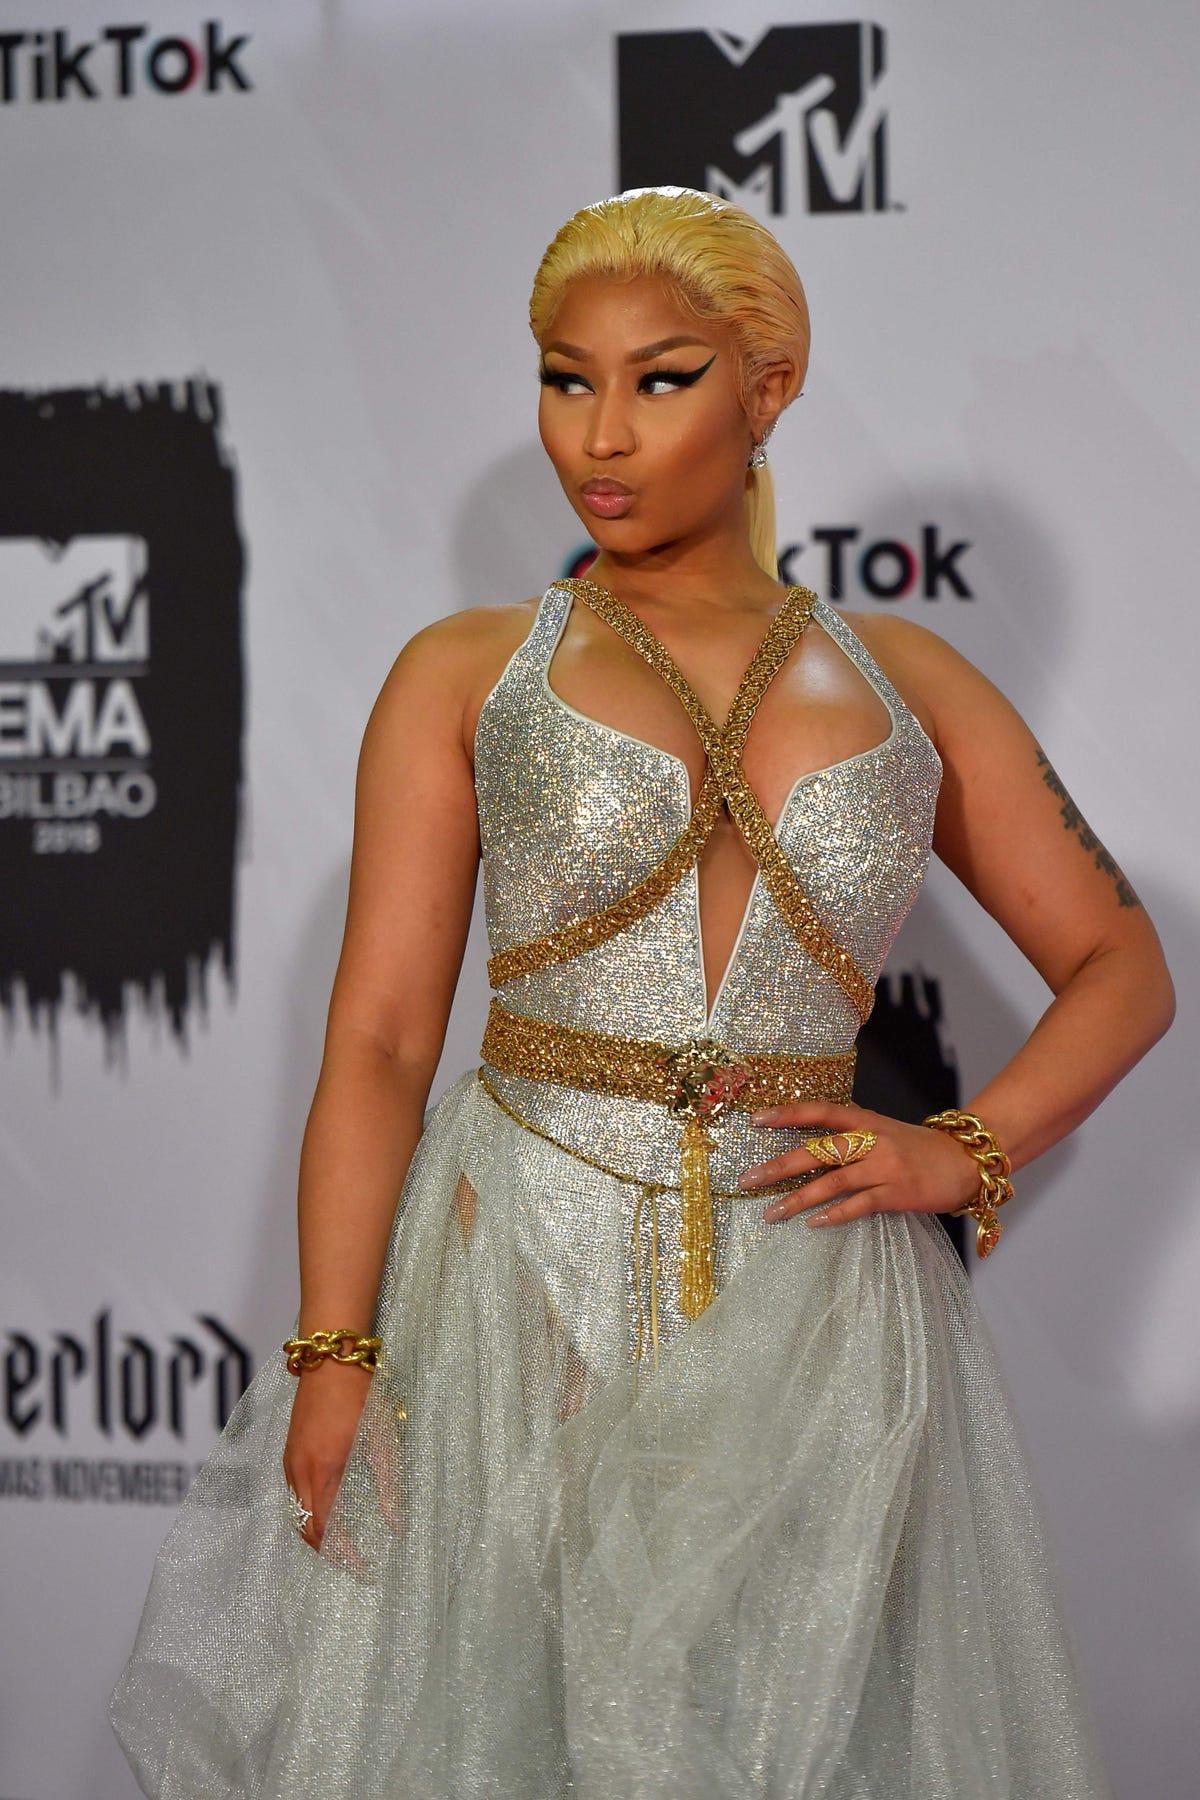 Nicki Minaj, registered sex offender Kenneth Petty Instagram